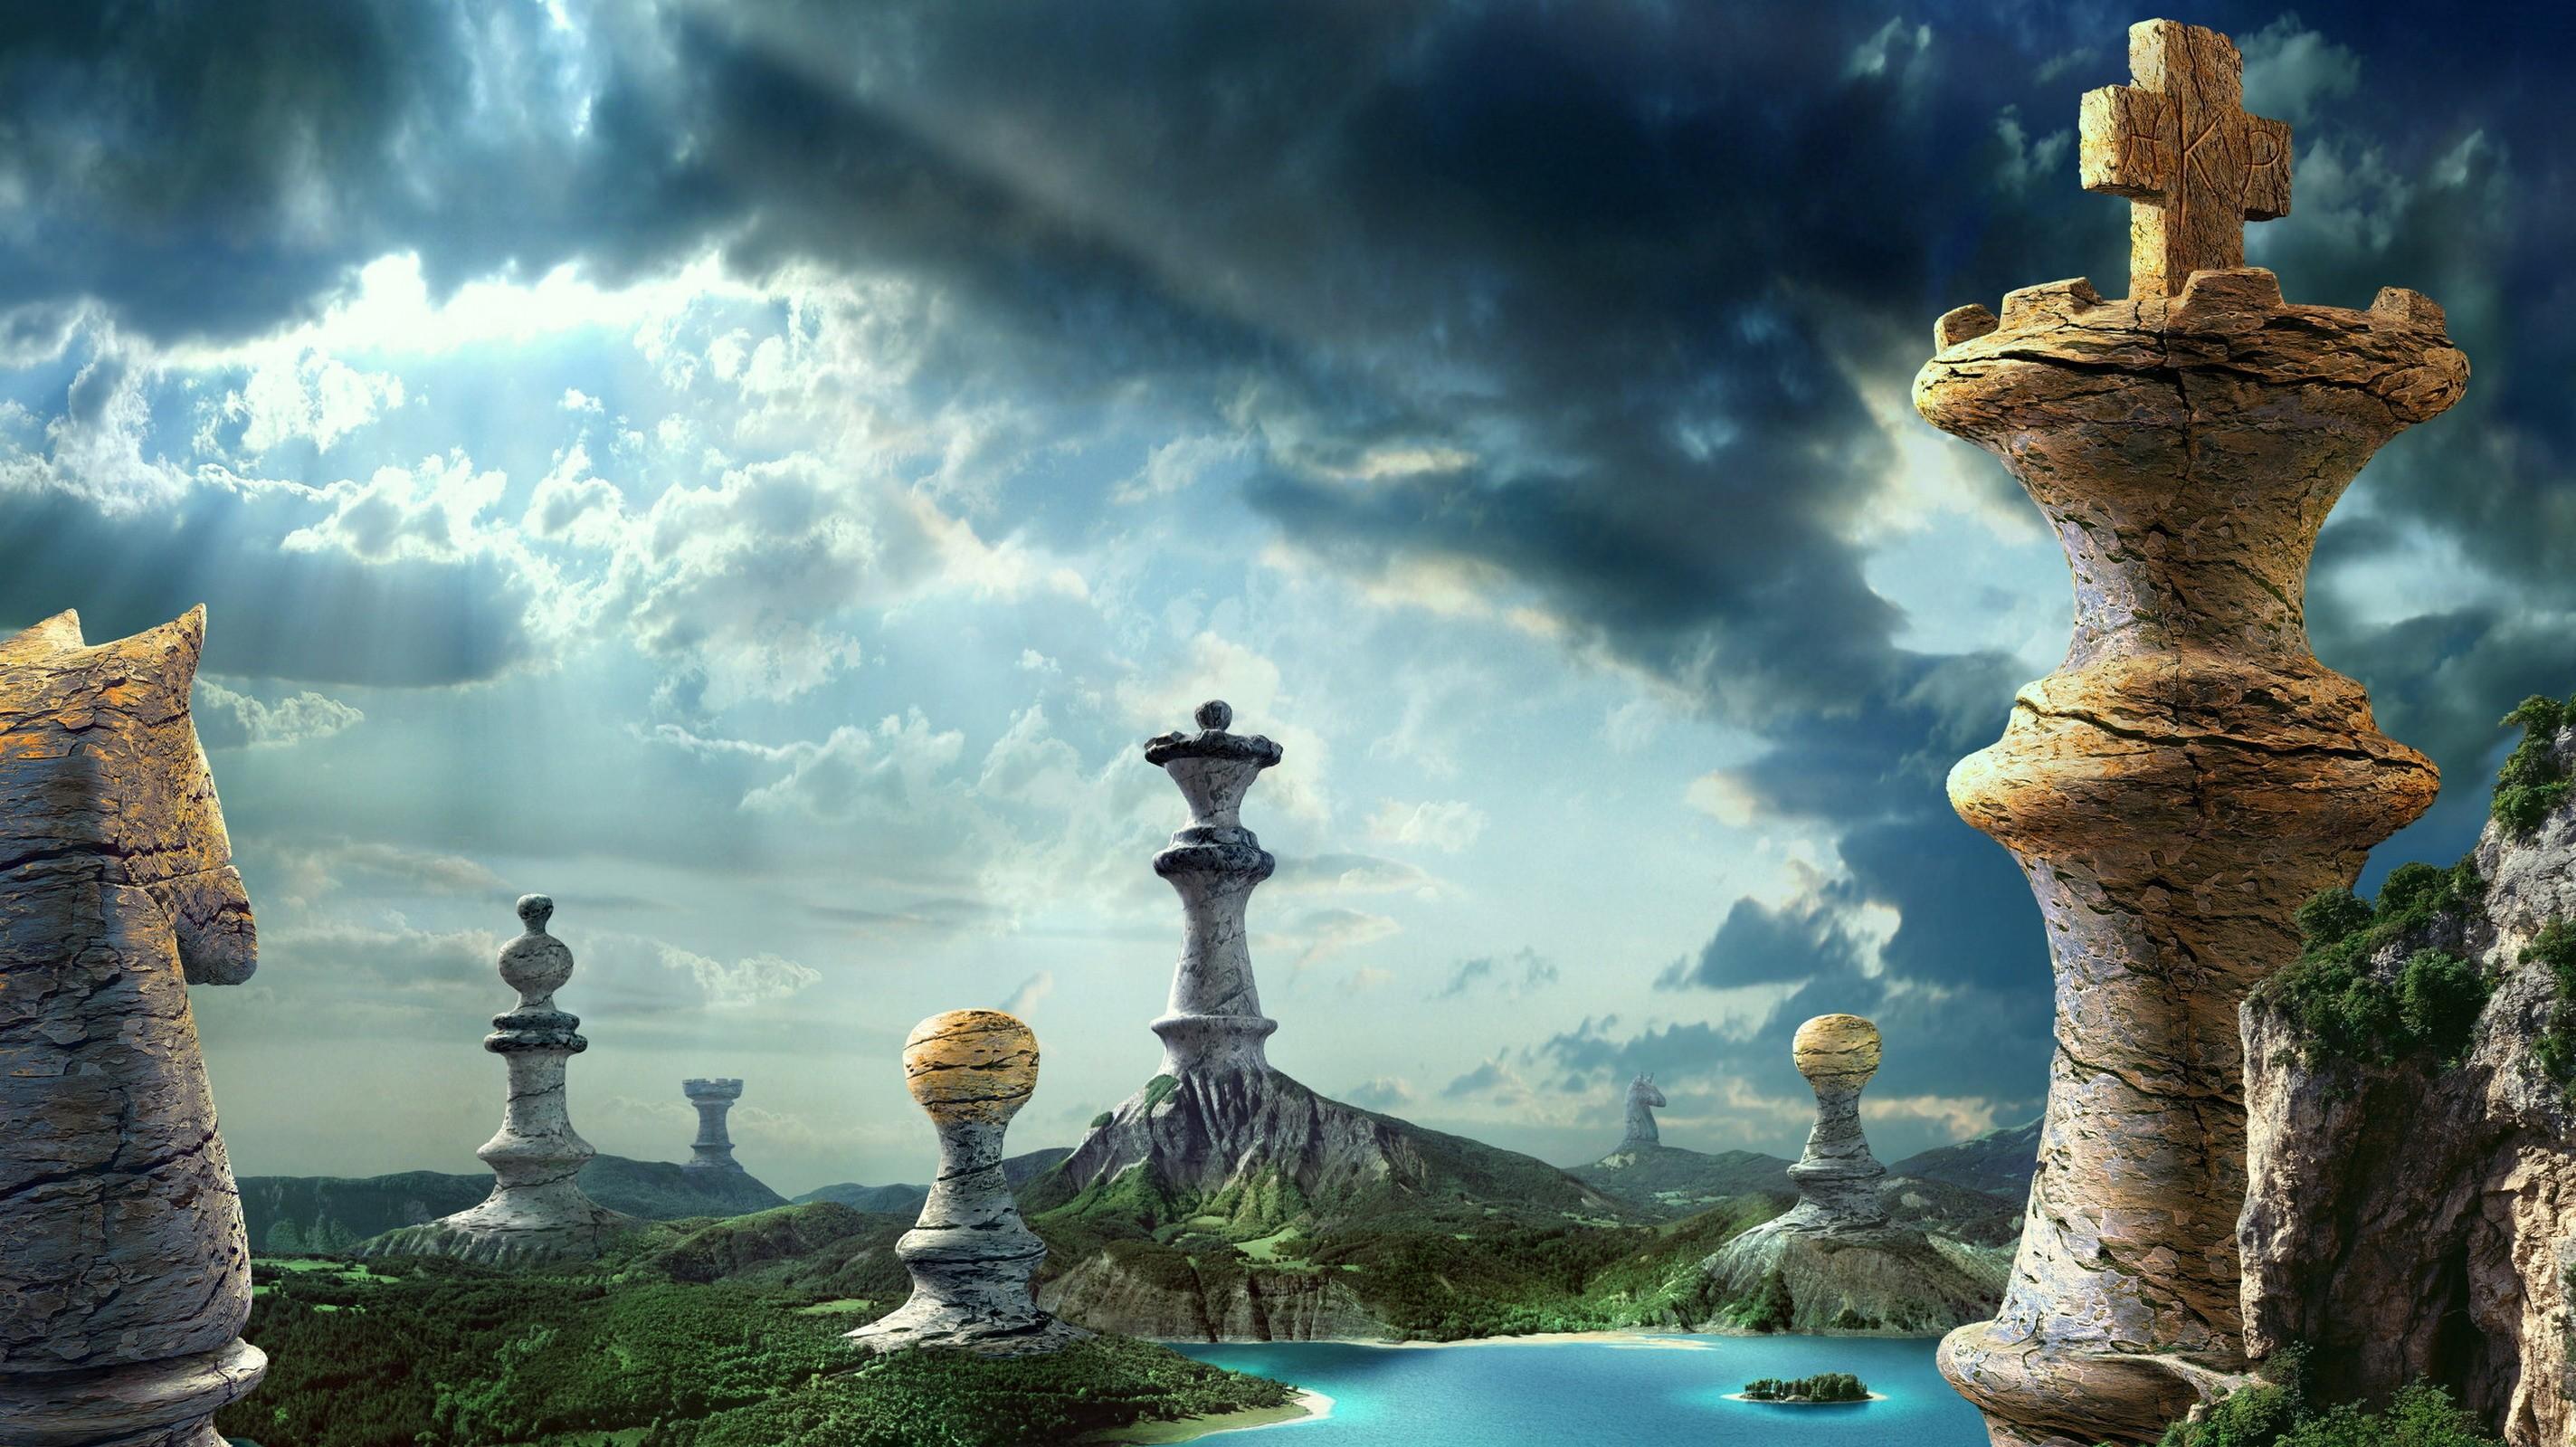 General 2847x1599 digital art fantasy art clouds nature landscape chess pawns king horse hills rock water island sunlight trees queen (royalty)